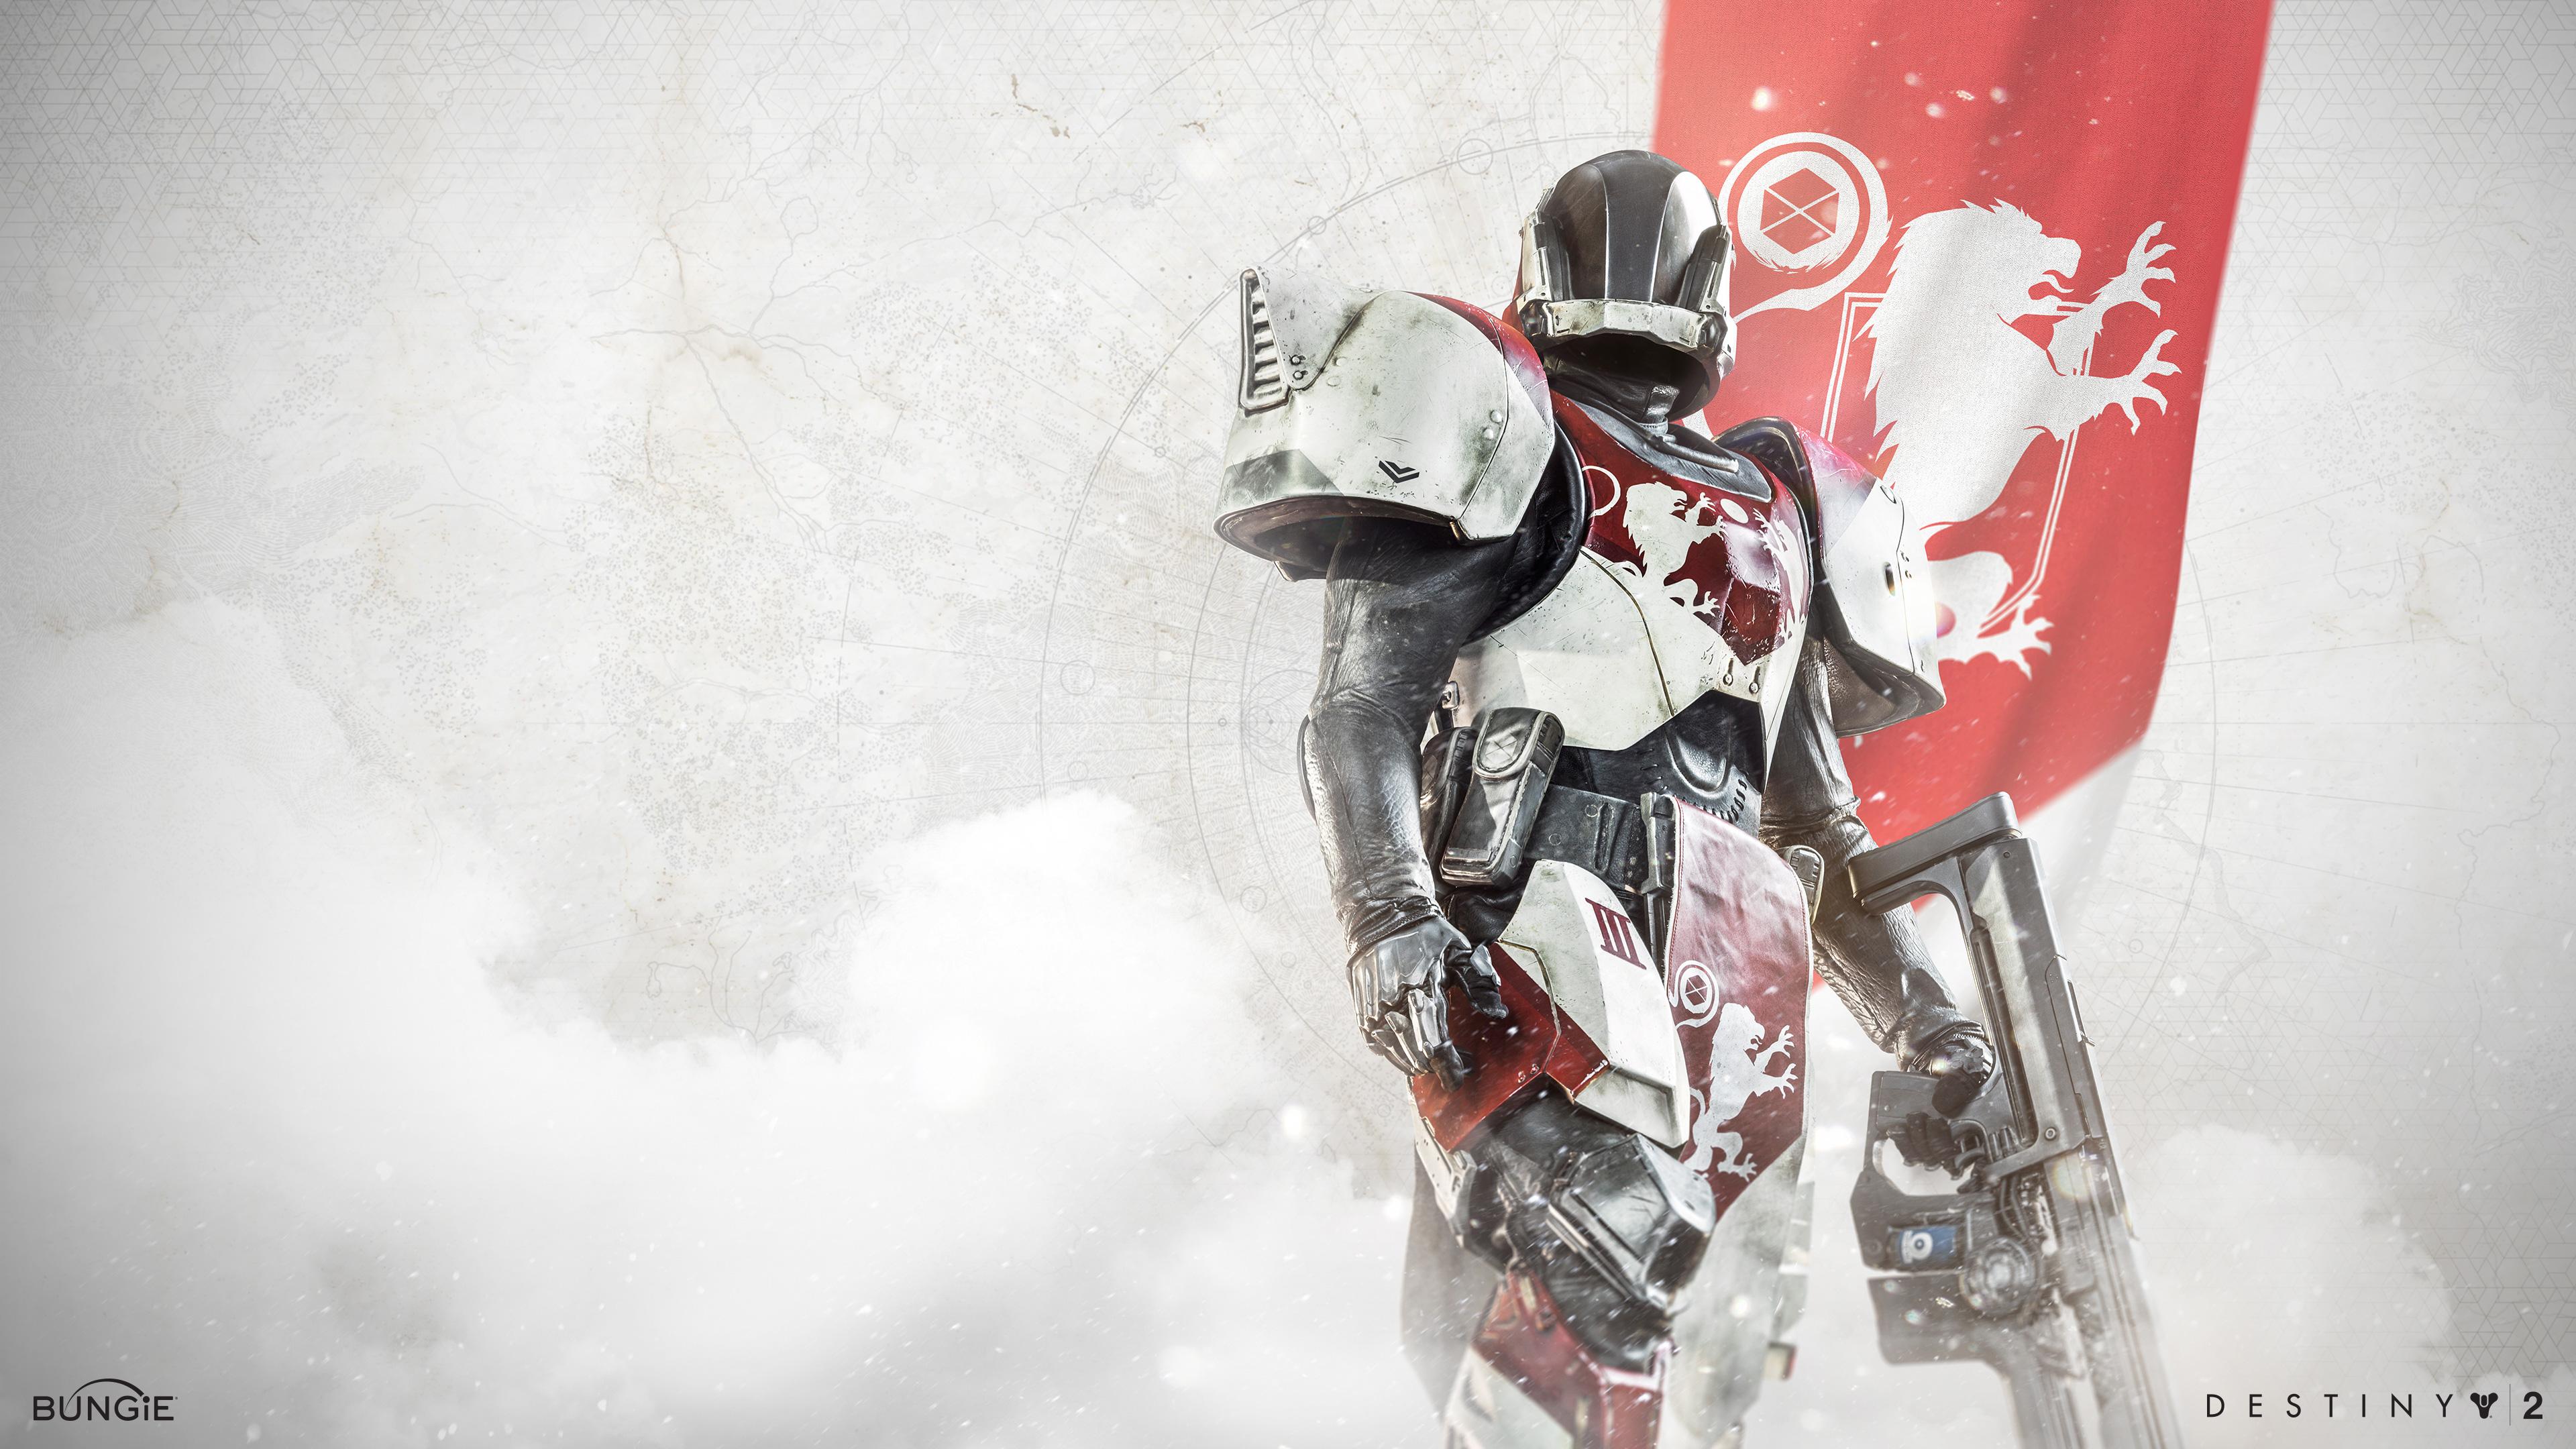 destiny 2 titan 4k 2017 hd games 4k wallpapers images